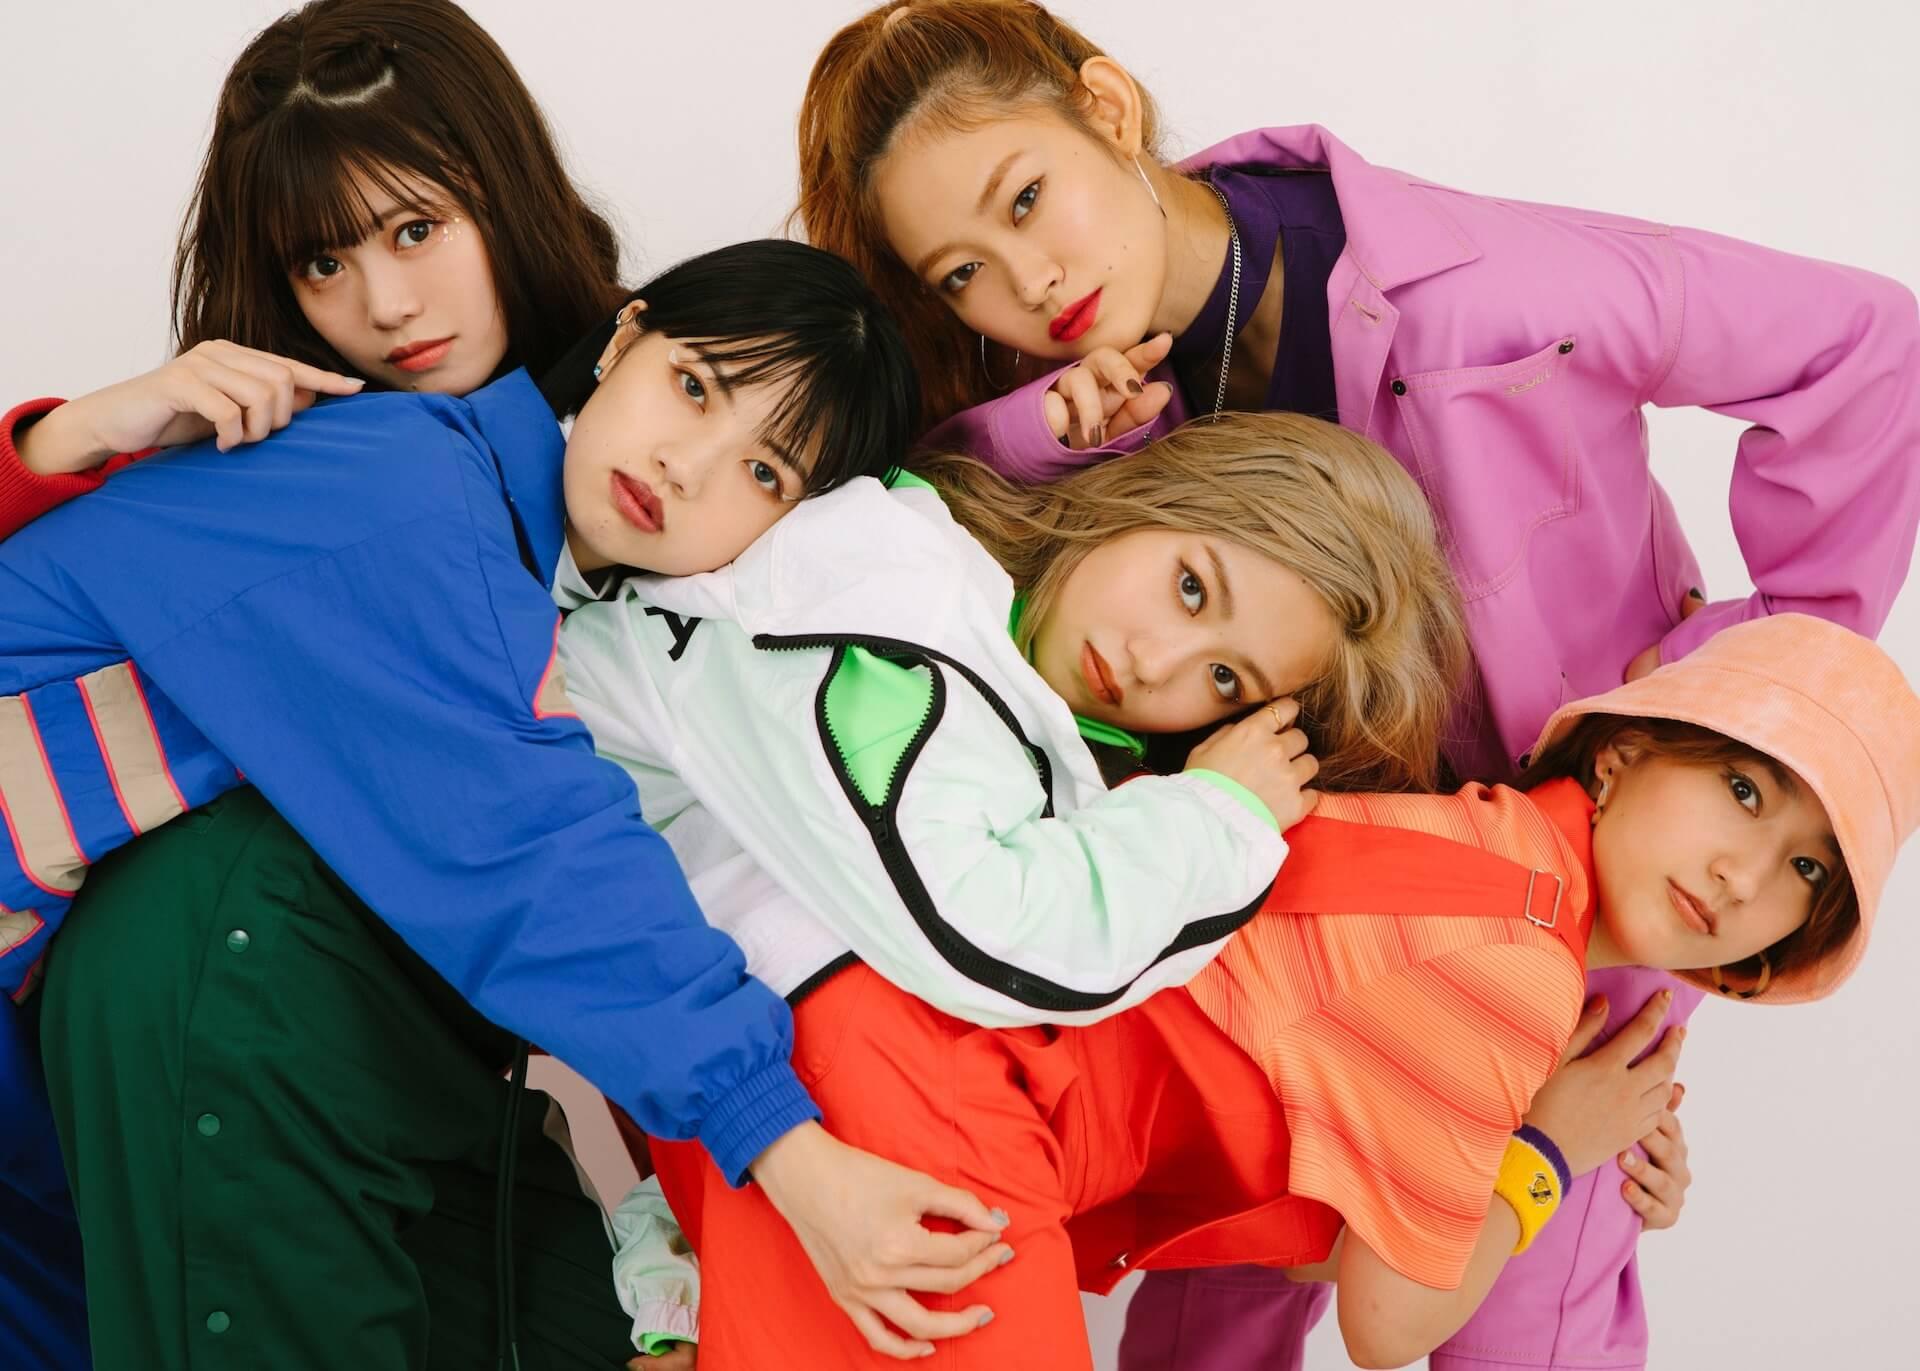 lyrical school、2021年1月リリースのアルバムよりvalknee作詞のシングル「FIVE SHOOTERS」のMVを公開 music201202-lyricalschool-1